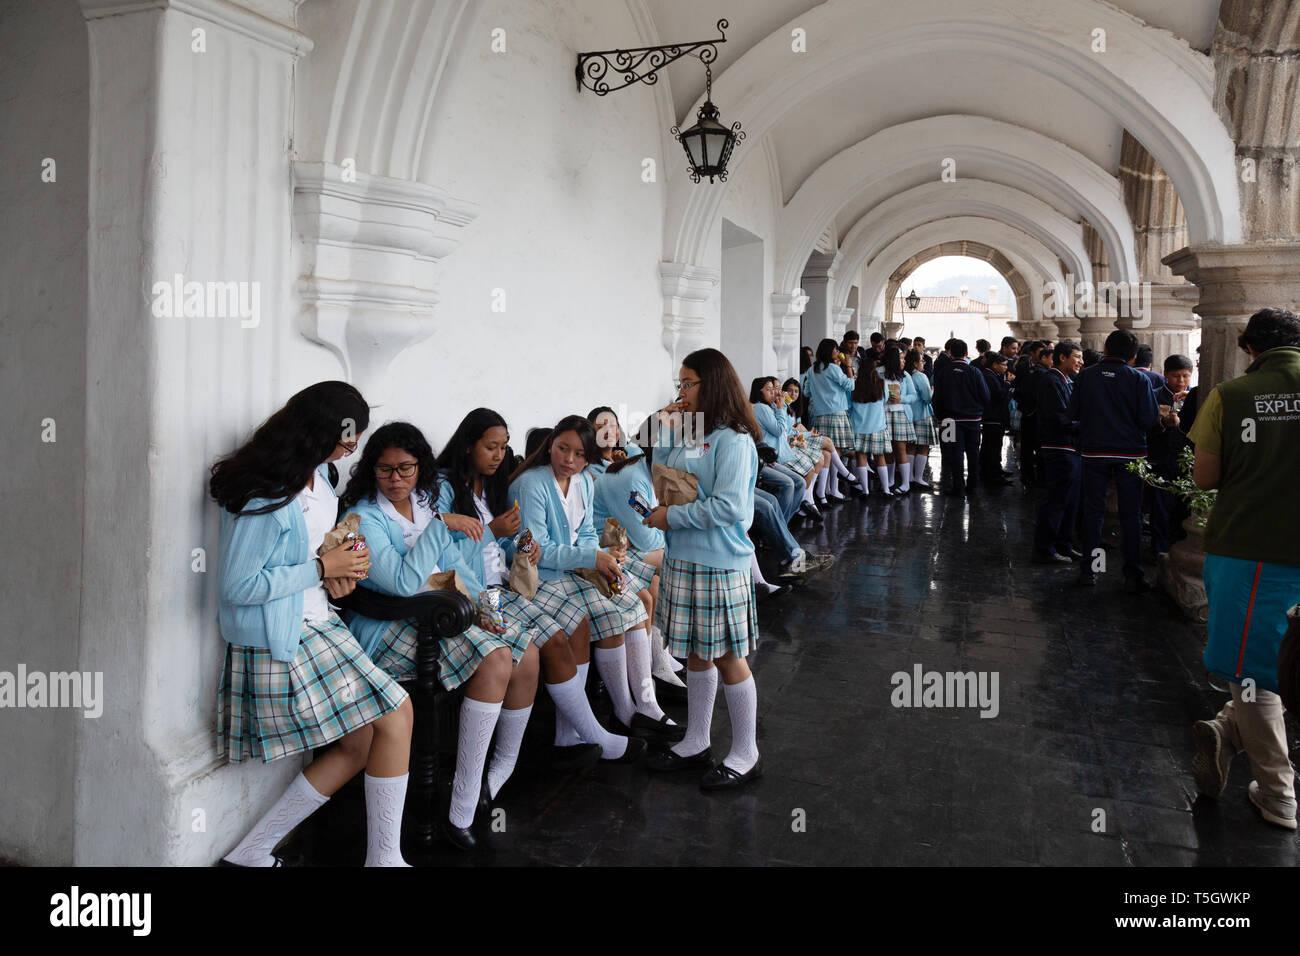 Guatemala schoolchildren in the Plaza Mayor, Antigua UNESCO World heritage site, Antigua Guatemala Central America - Stock Image